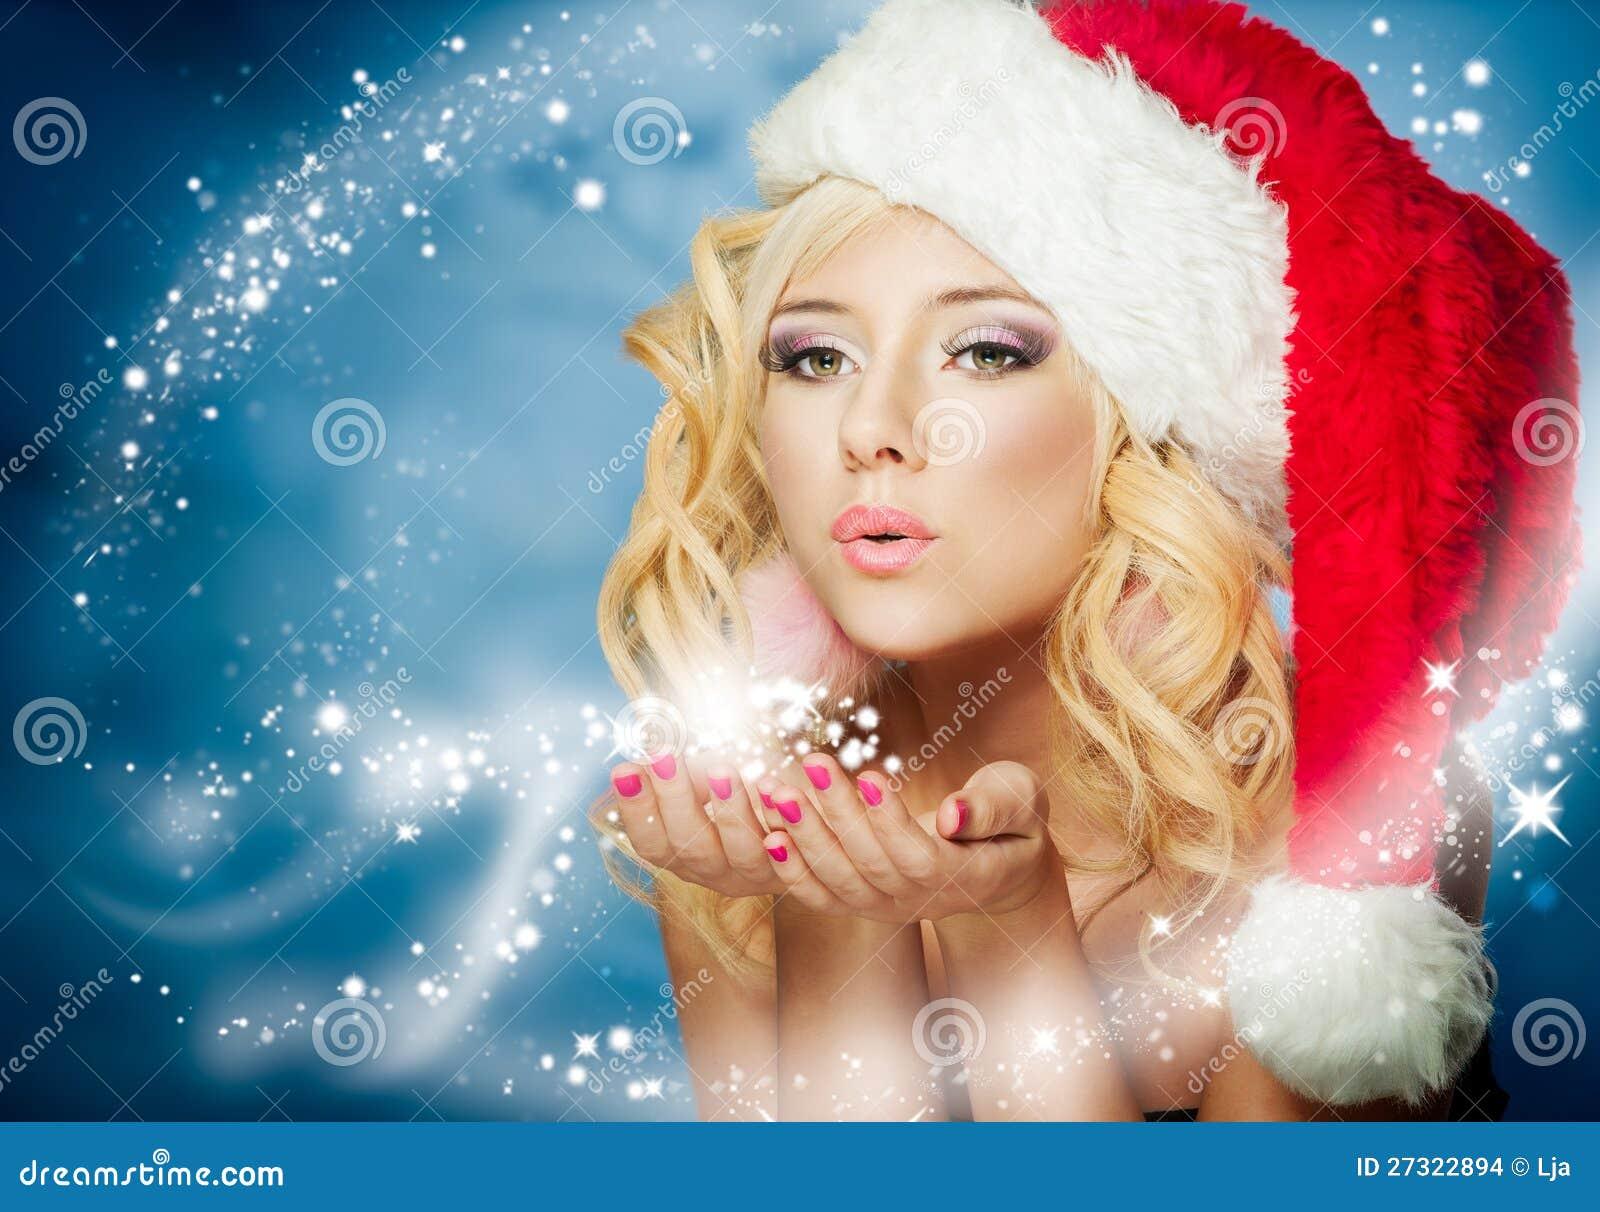 Christmas Woman Stock Images - Image: 27322894